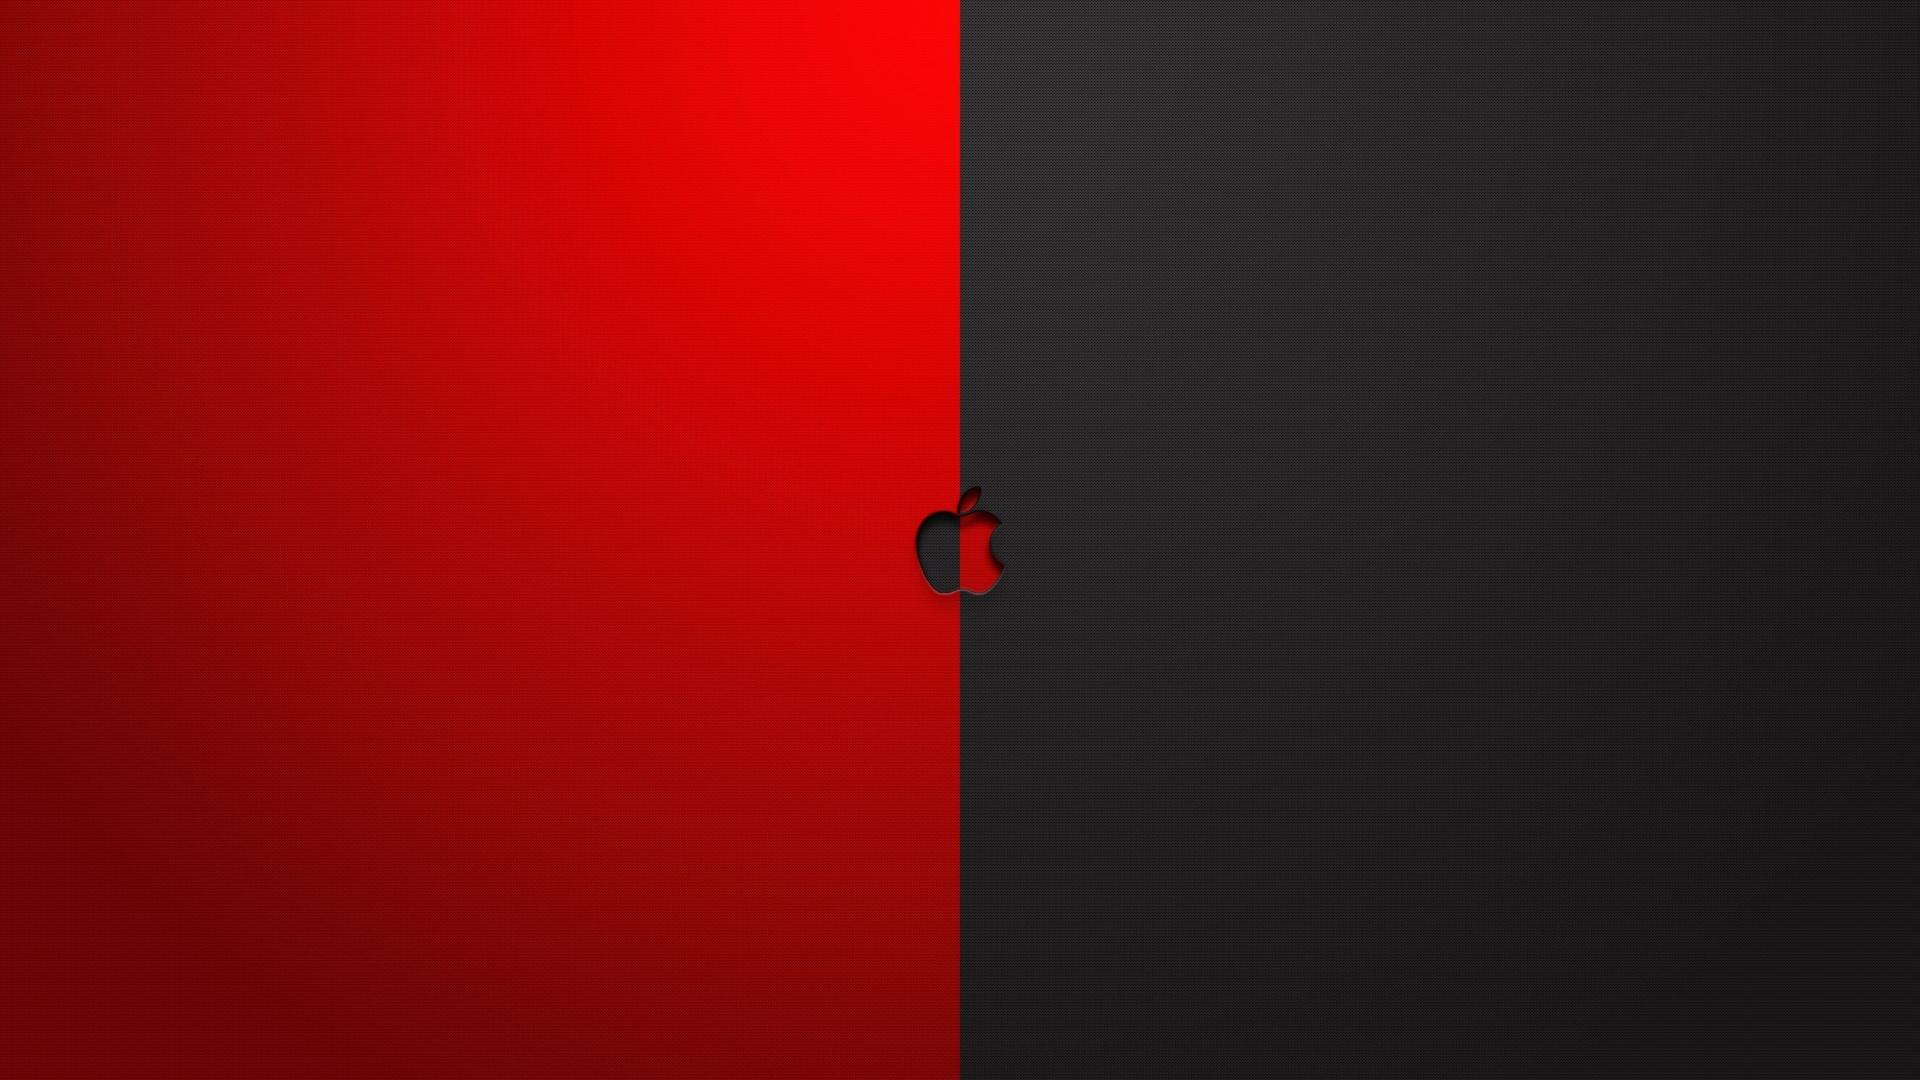 Apple-Logo-Computer-Mac-Download-Free-Mac-wallpaper-wpc9002310